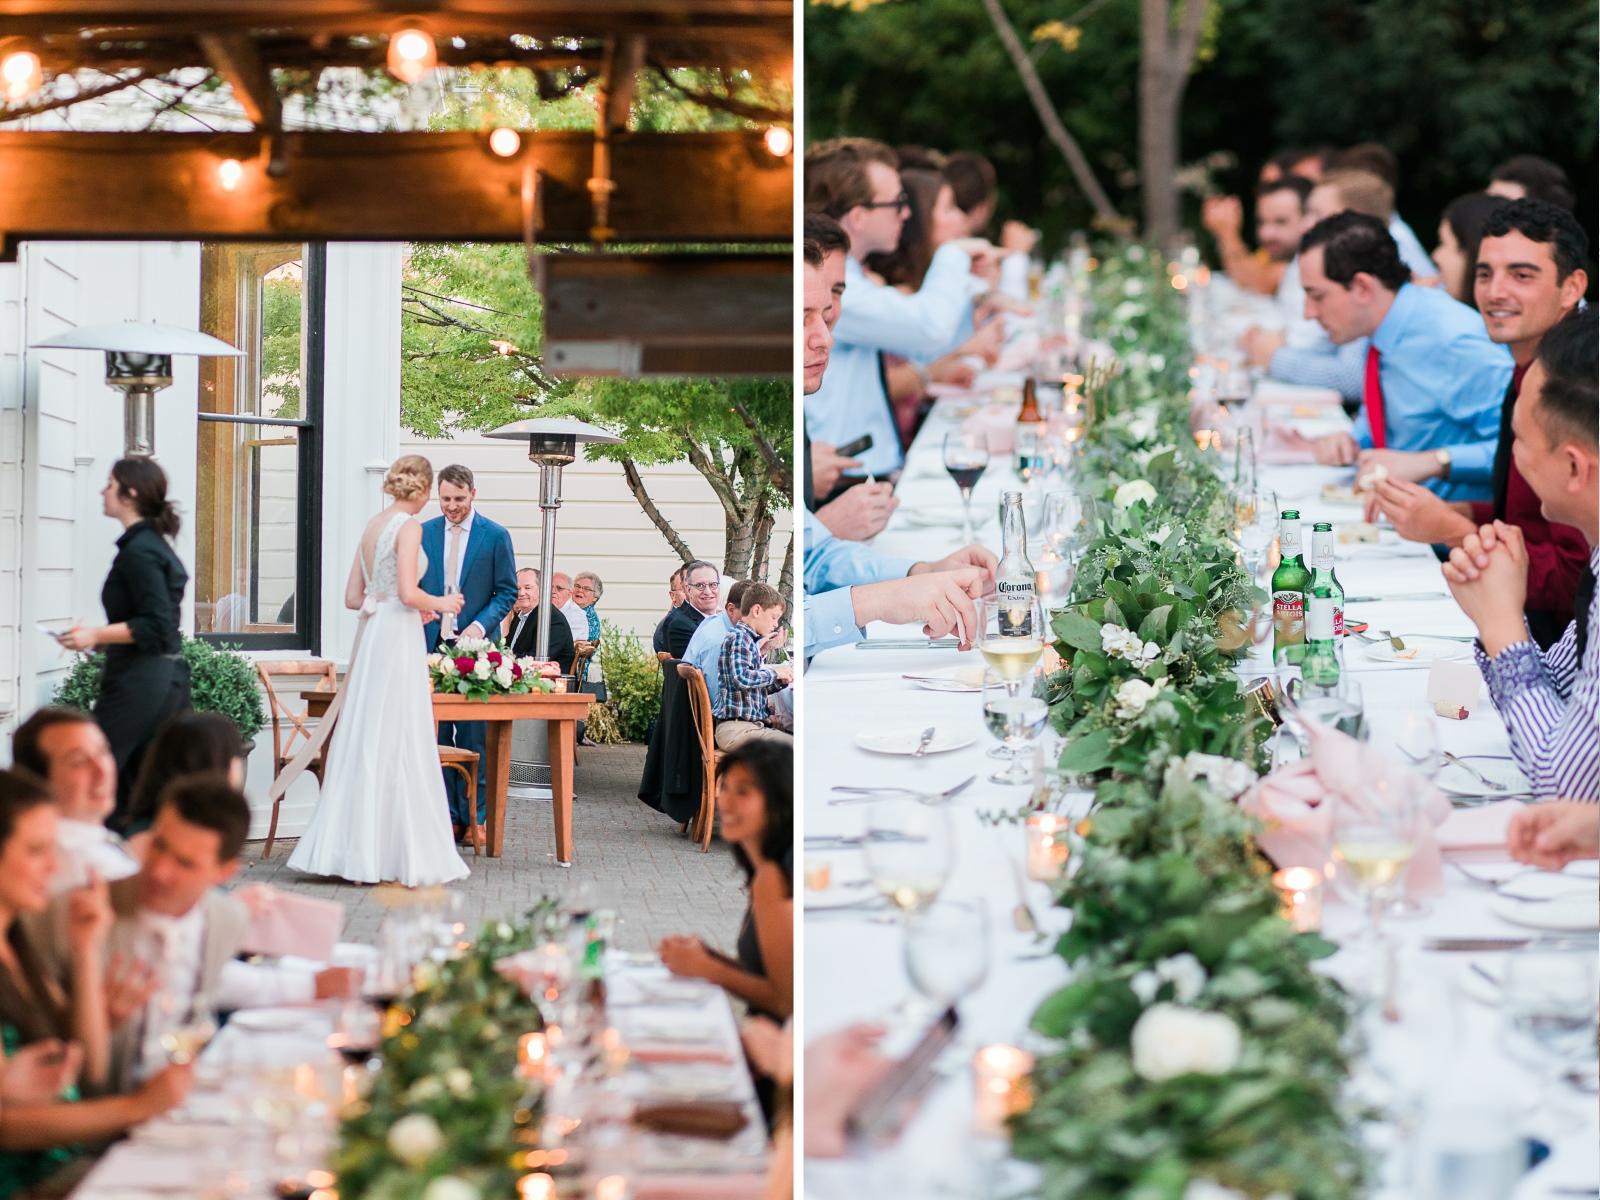 Generals Daughter Wedding Photos by JBJ Pictures - Ramekins Wedding Venue Photographer in Sonoma, Napa (41).jpg